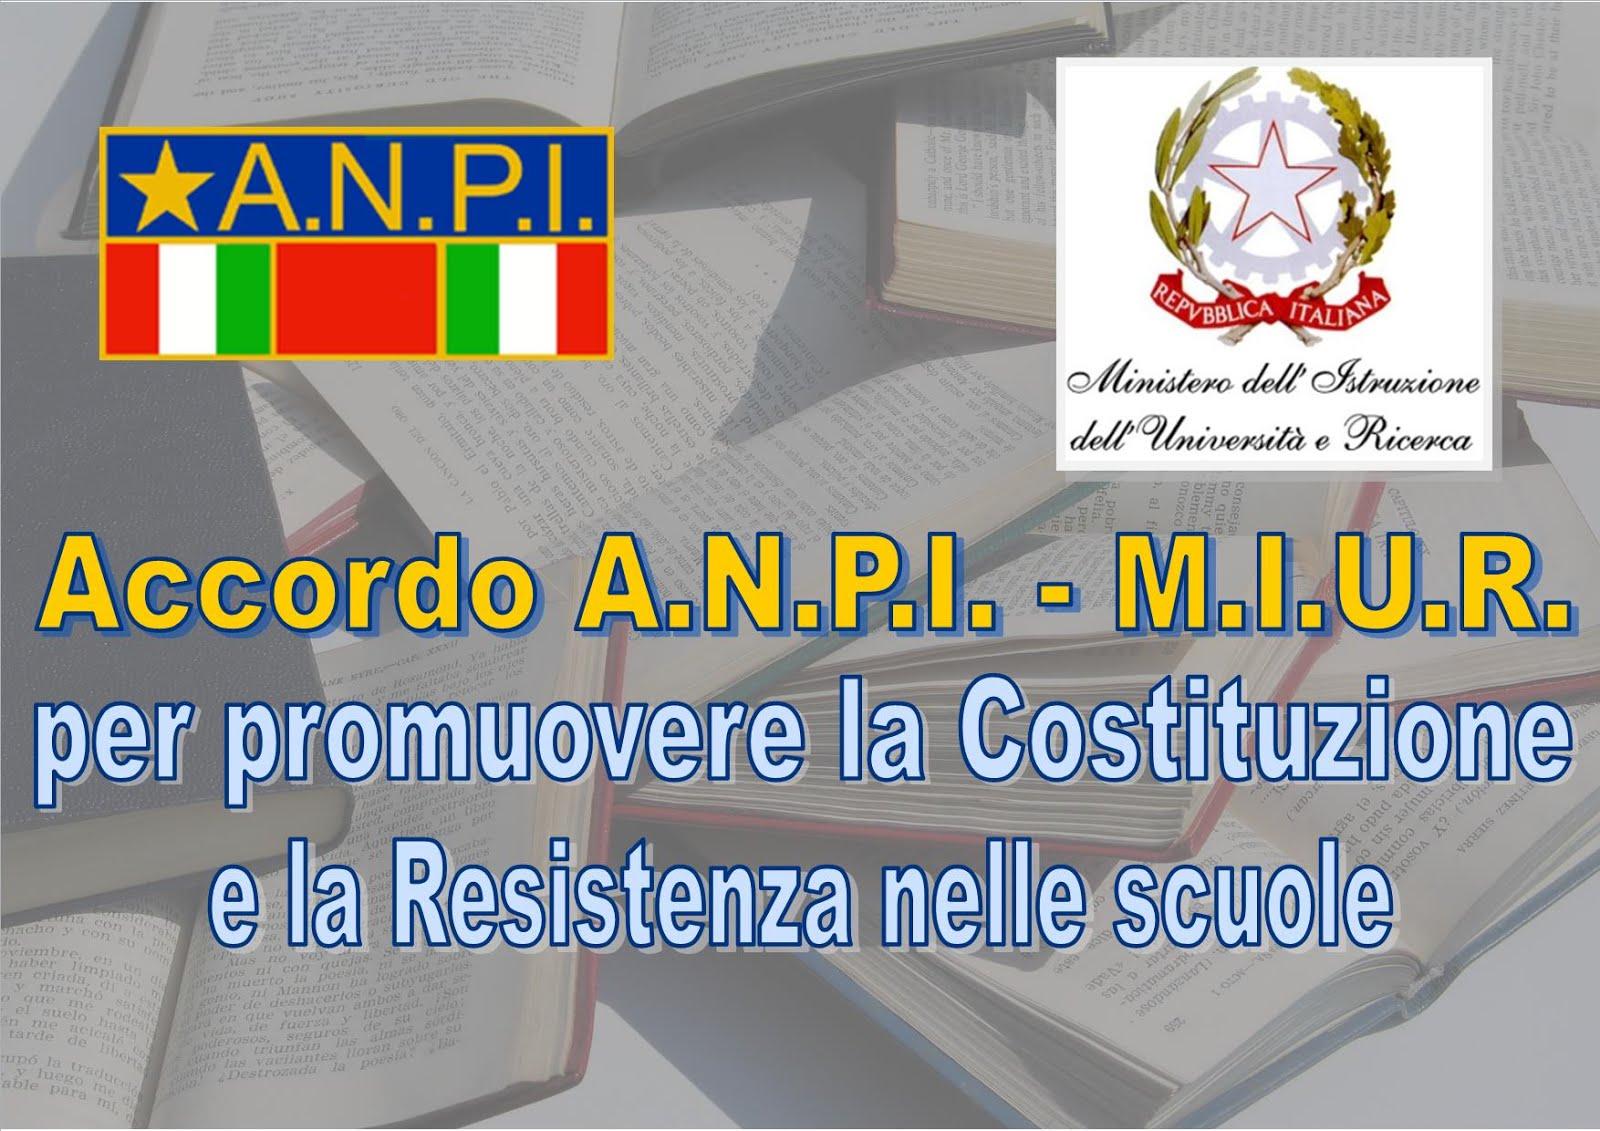 A.N.P.I. - M.I.U.R.